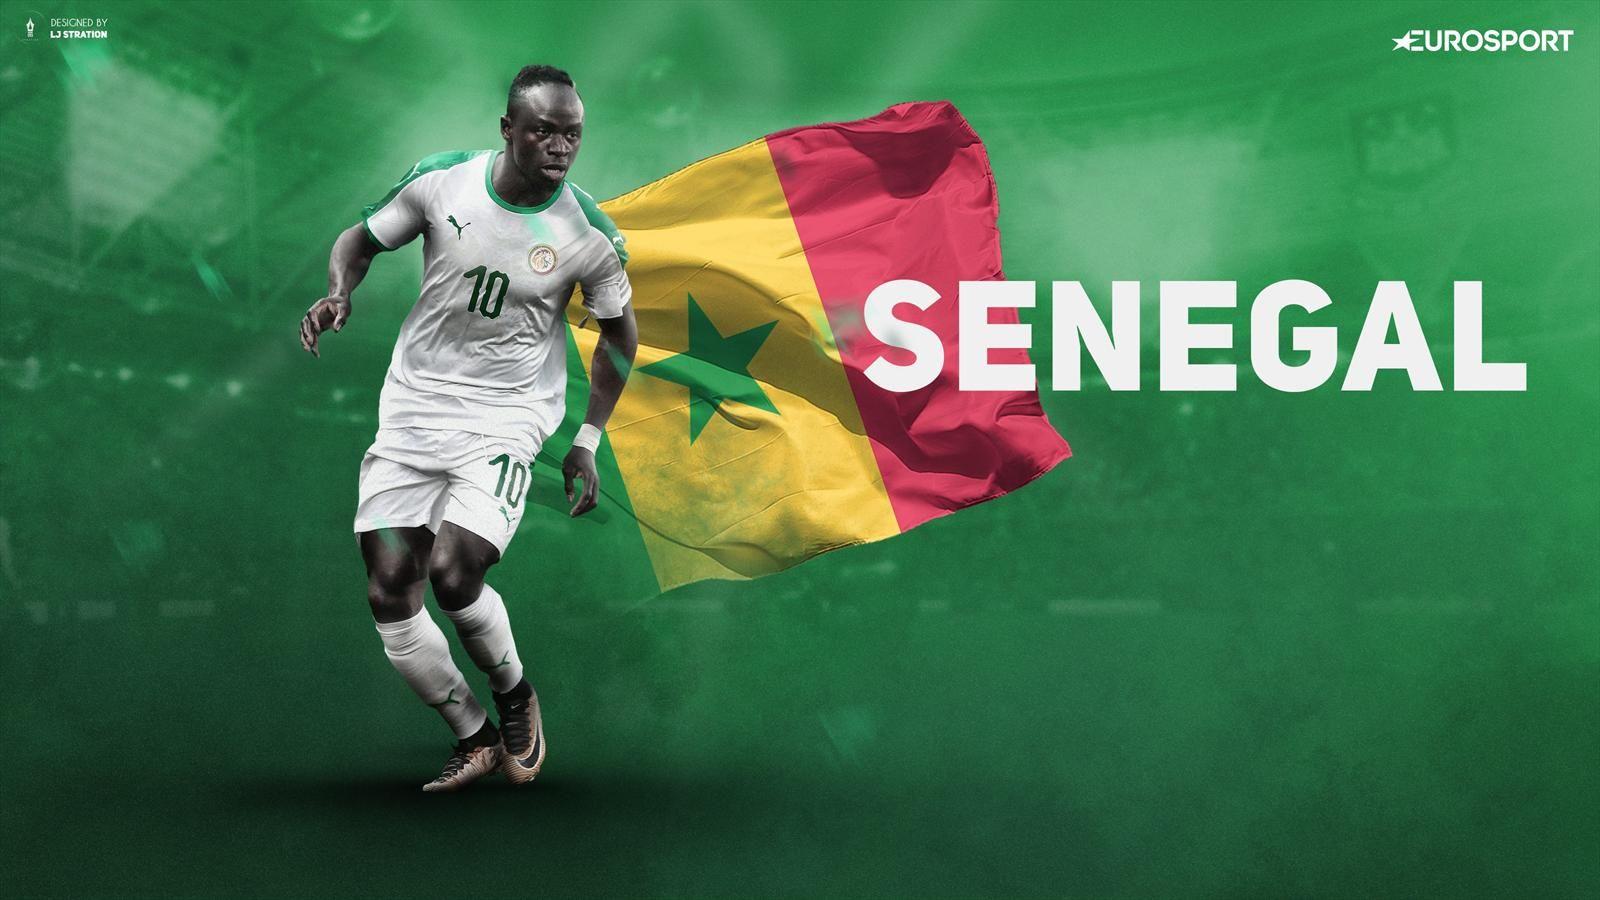 1xbet Senegal